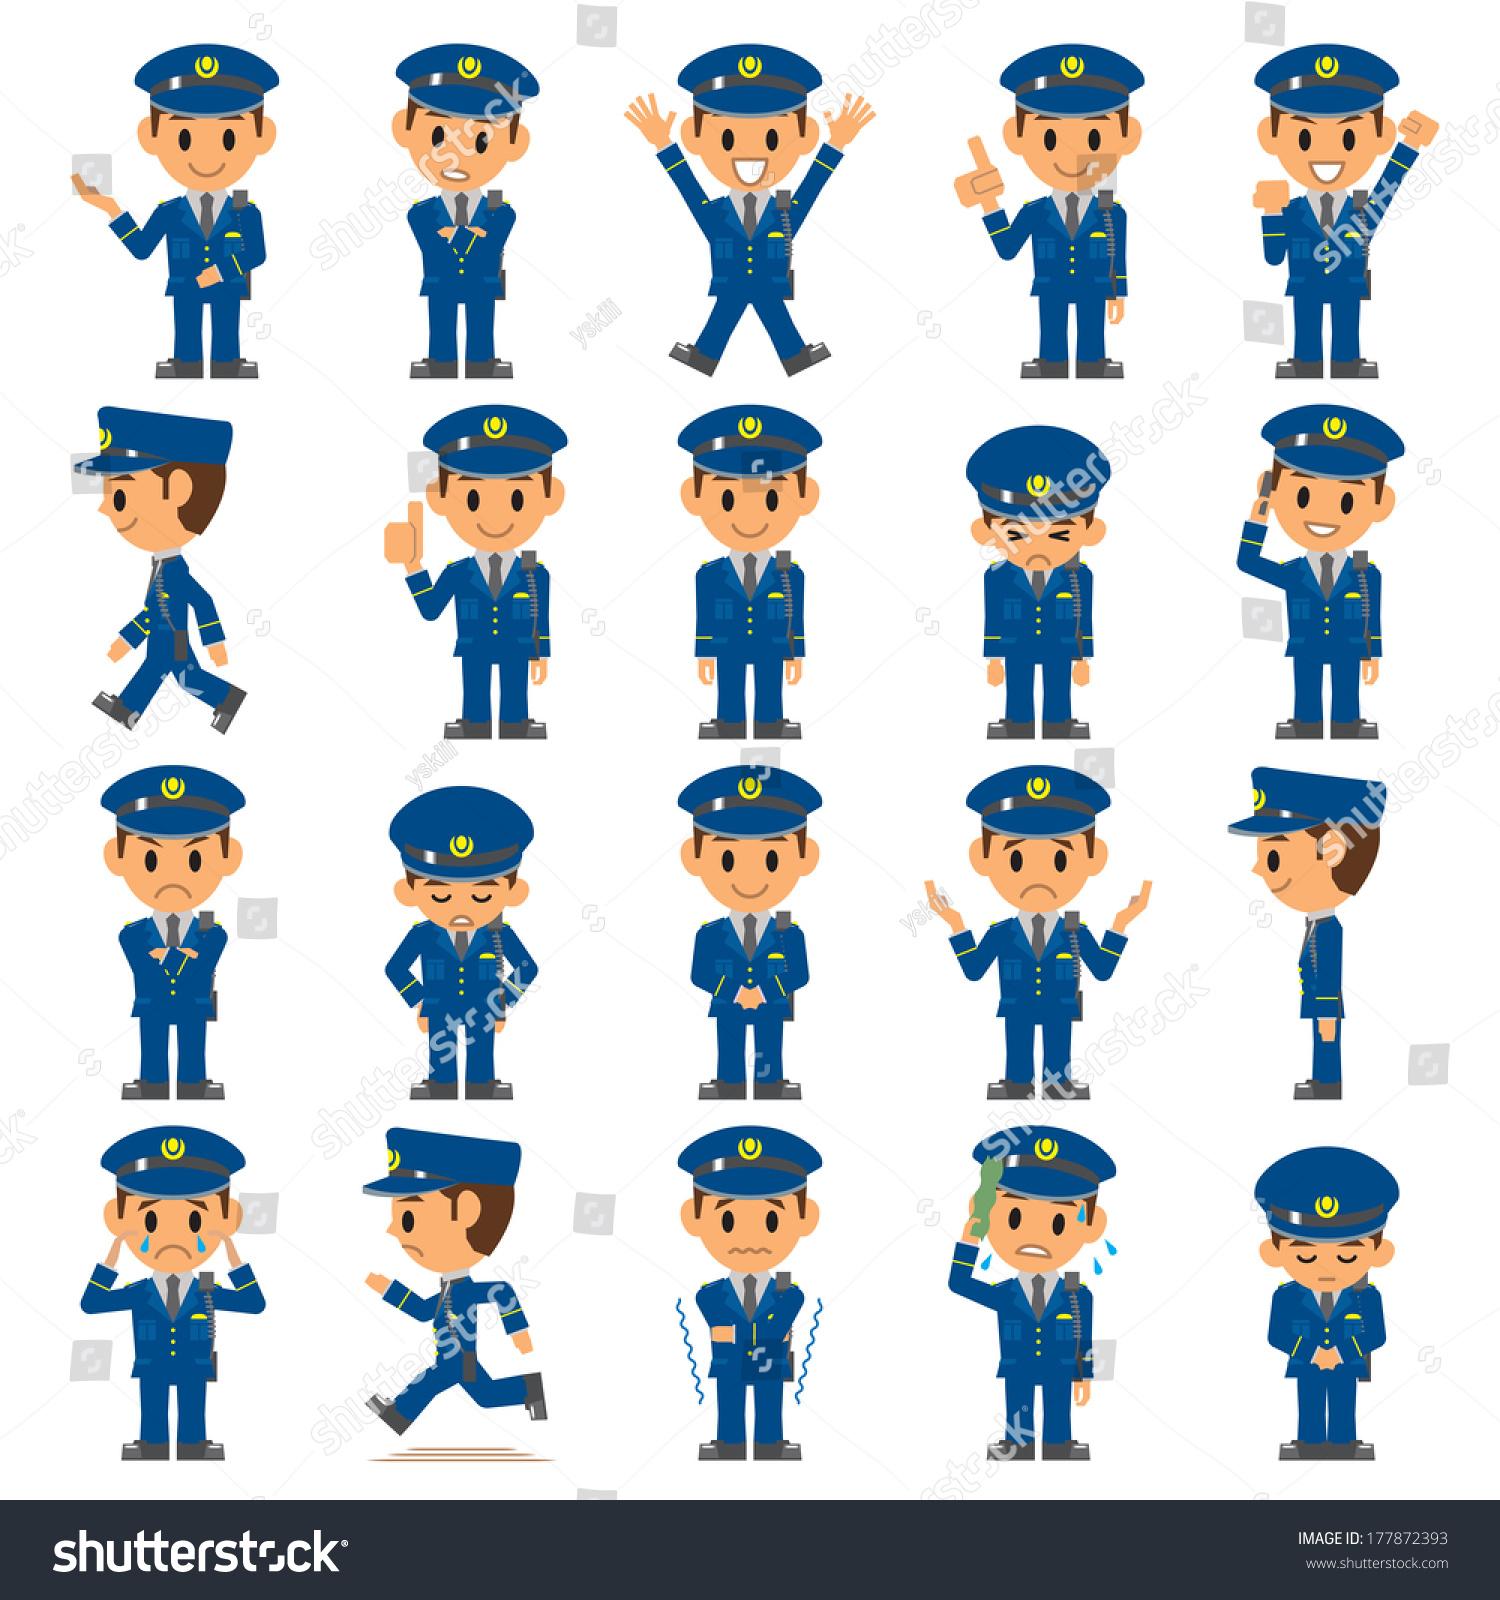 POLICE GUNGSUHCHE TÉLÉCHARGER